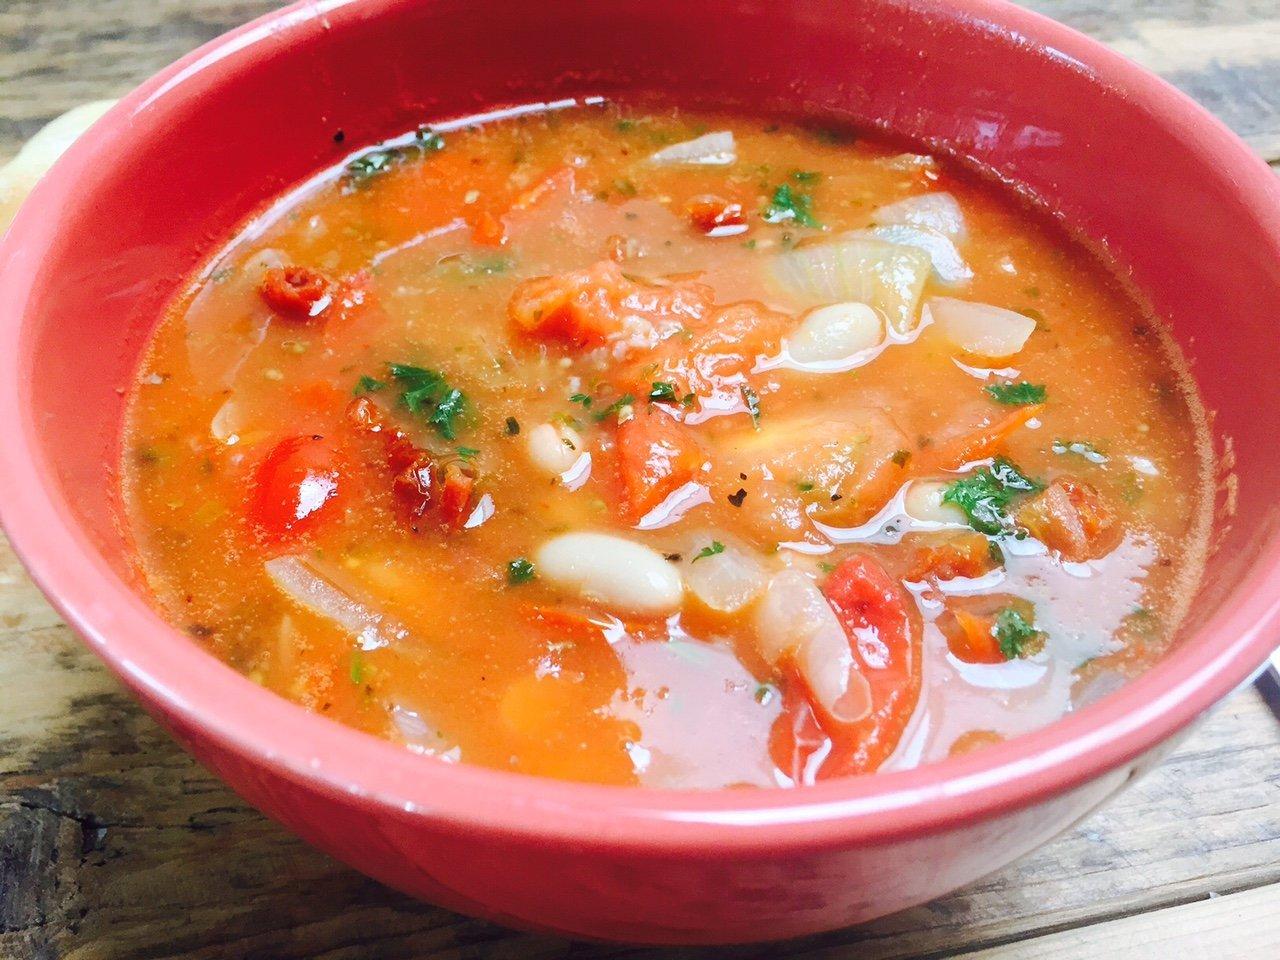 Witte bonen in tomatensoep Italiaanse tomatensoep recept foodblog Foodinista